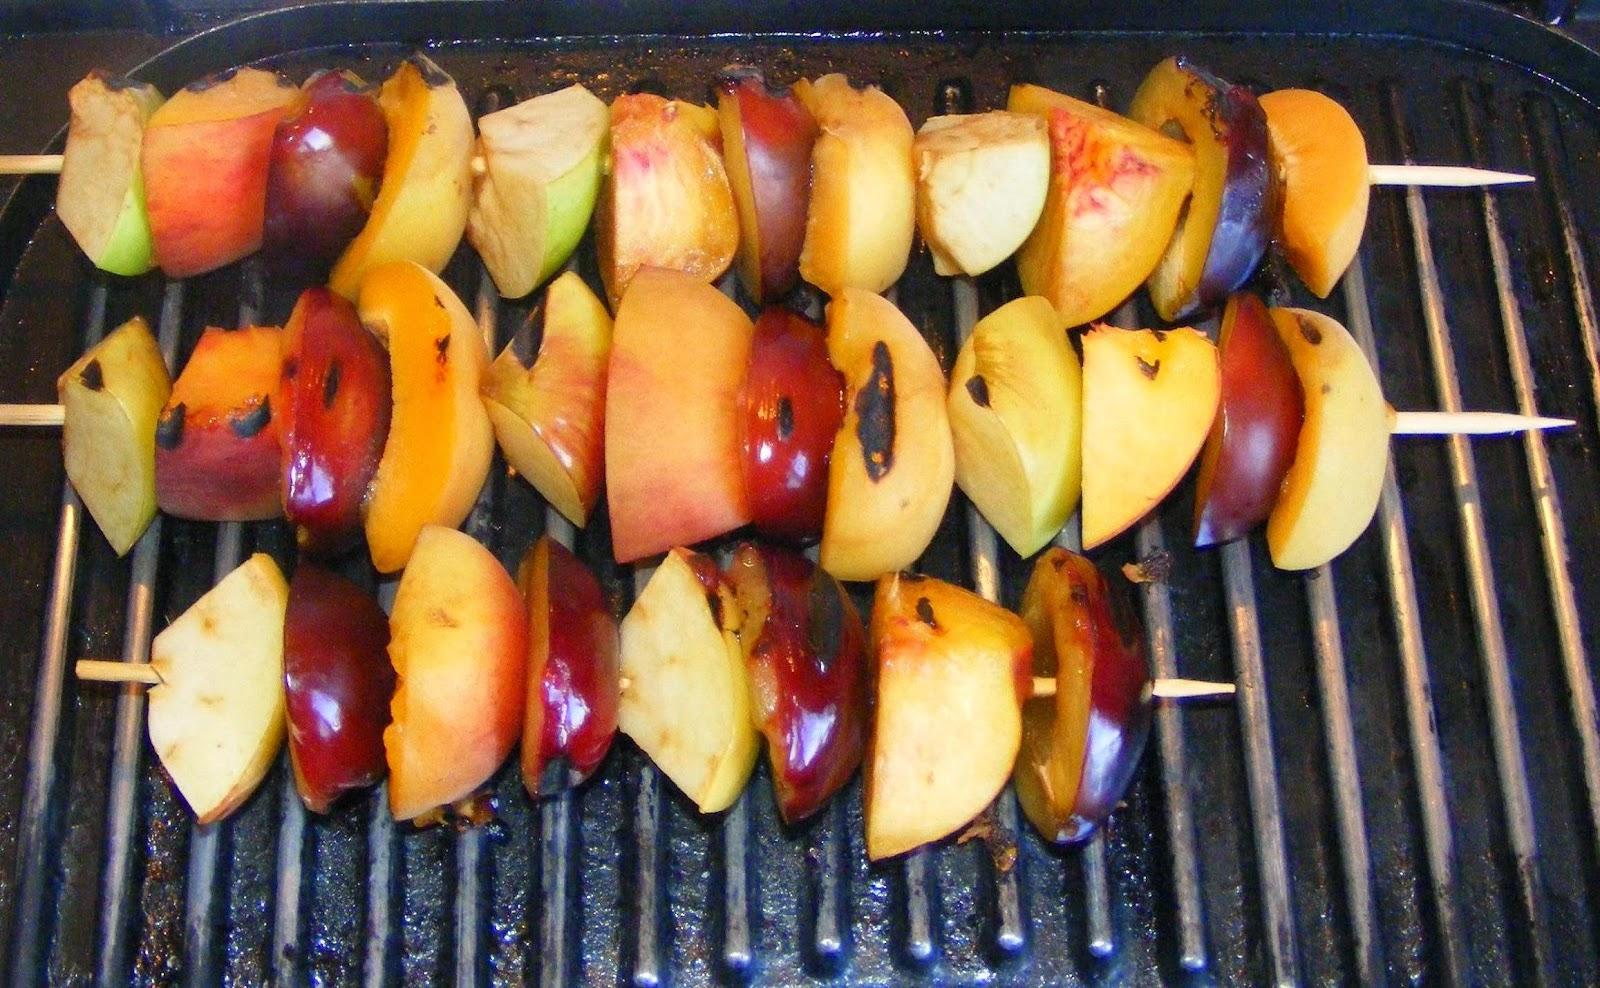 frigarui, preparare frigarui de fructe la gratar, preparare frigarui de fructe la gril, reteta frigarui, retete frigarui, frigarui de fructe, frigarui din fructe, frigarui cu fructe, retete cu fructe, fructe la gratar, fructe la gril, retete culinare,